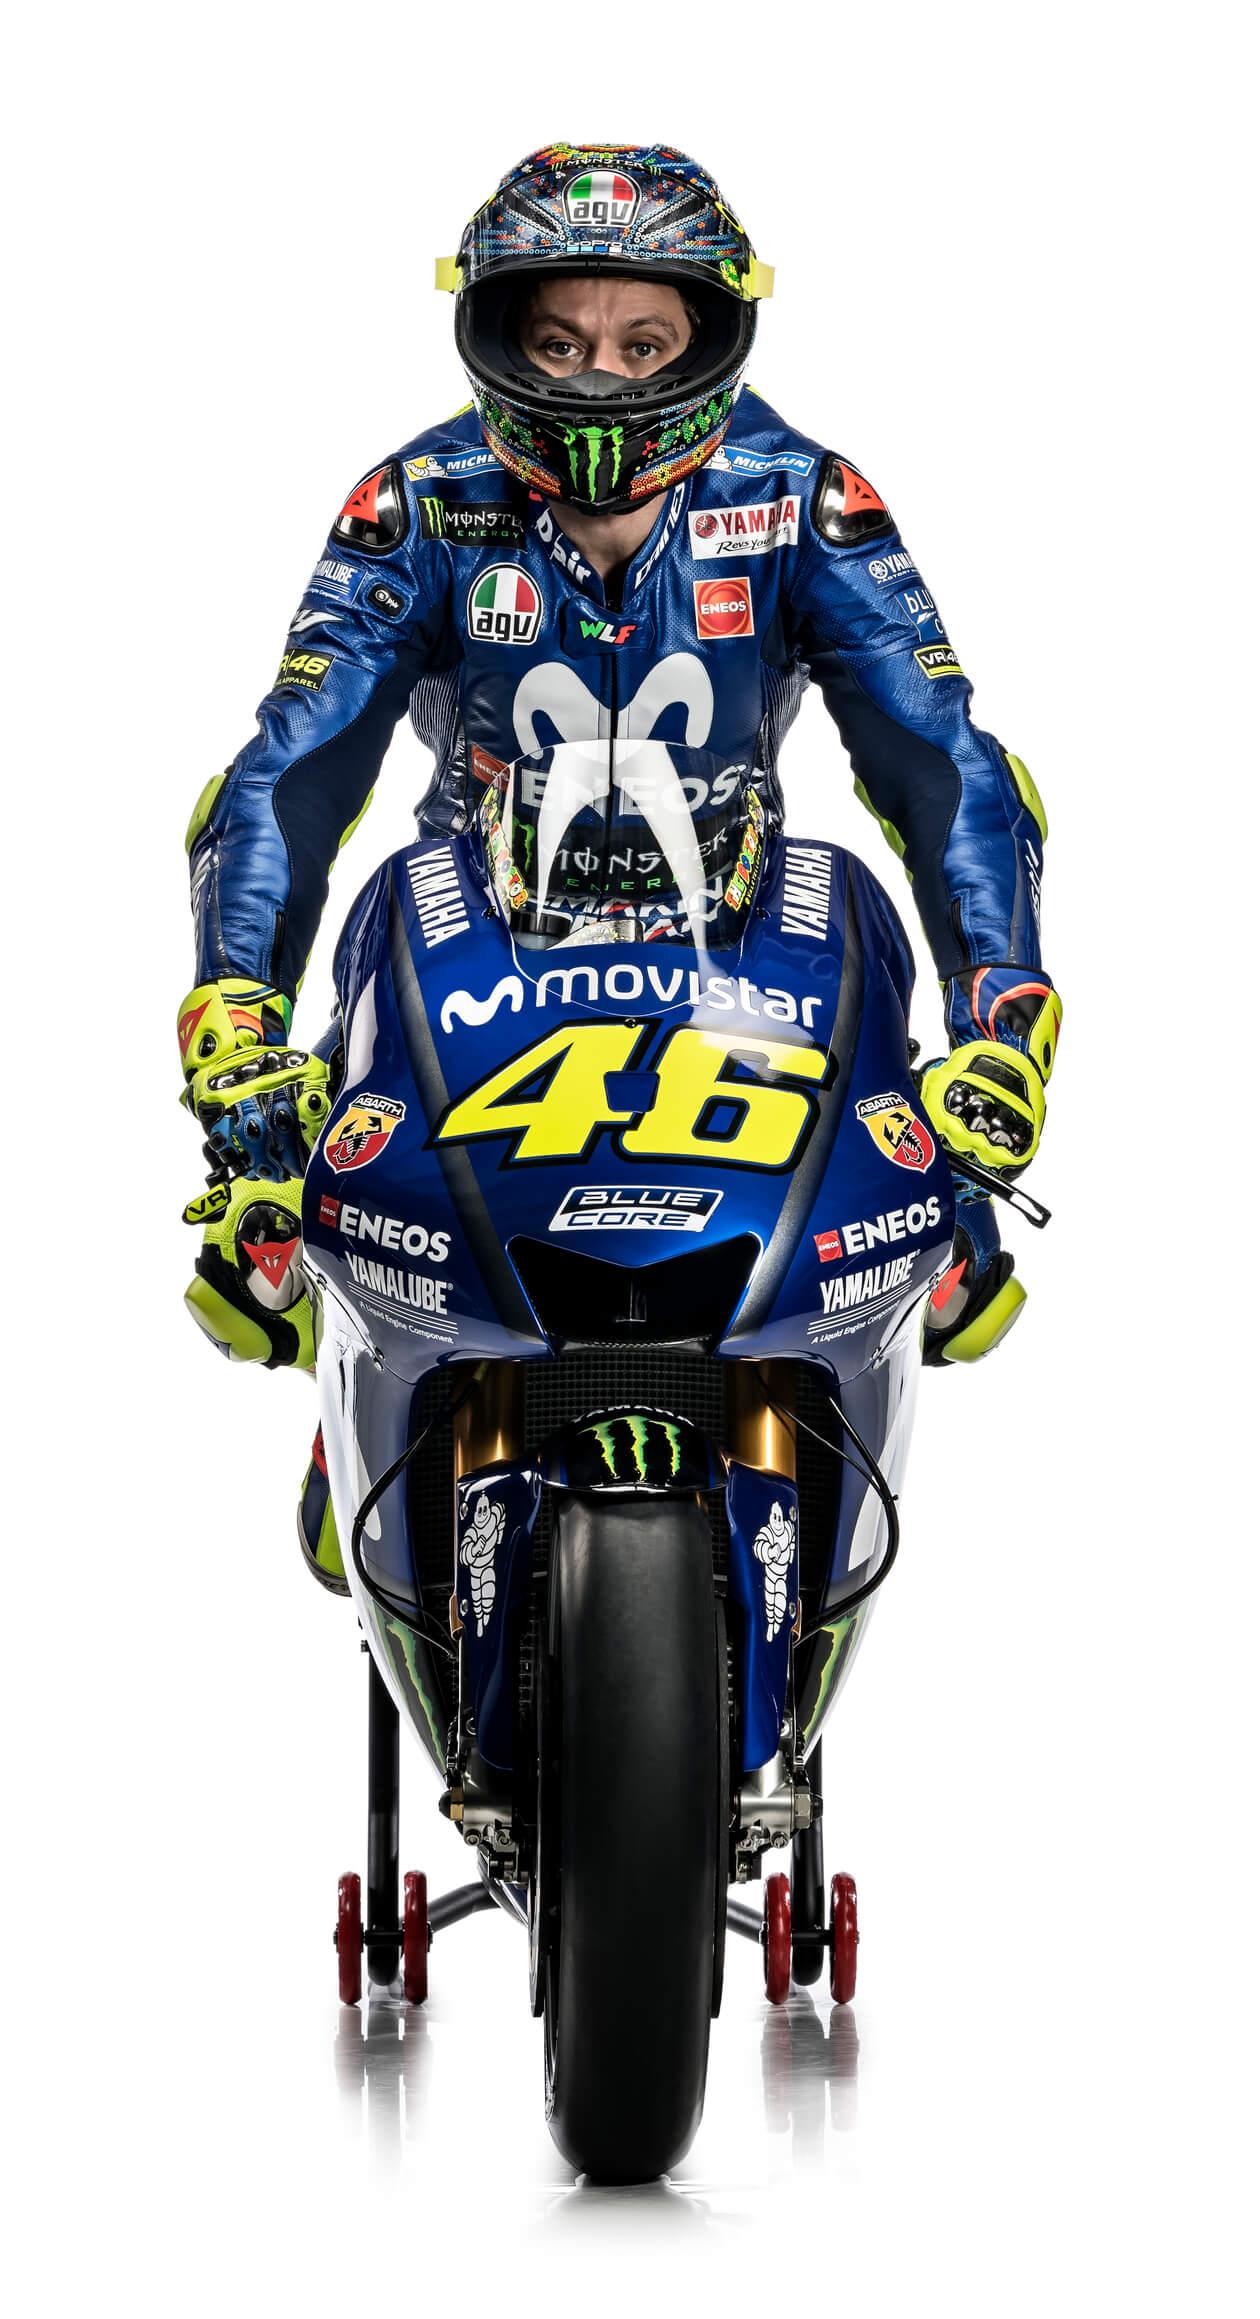 Motogp18 バレンティーノ ロッシ 18年シーズンのスタジオ写真 気になるバイクニュース